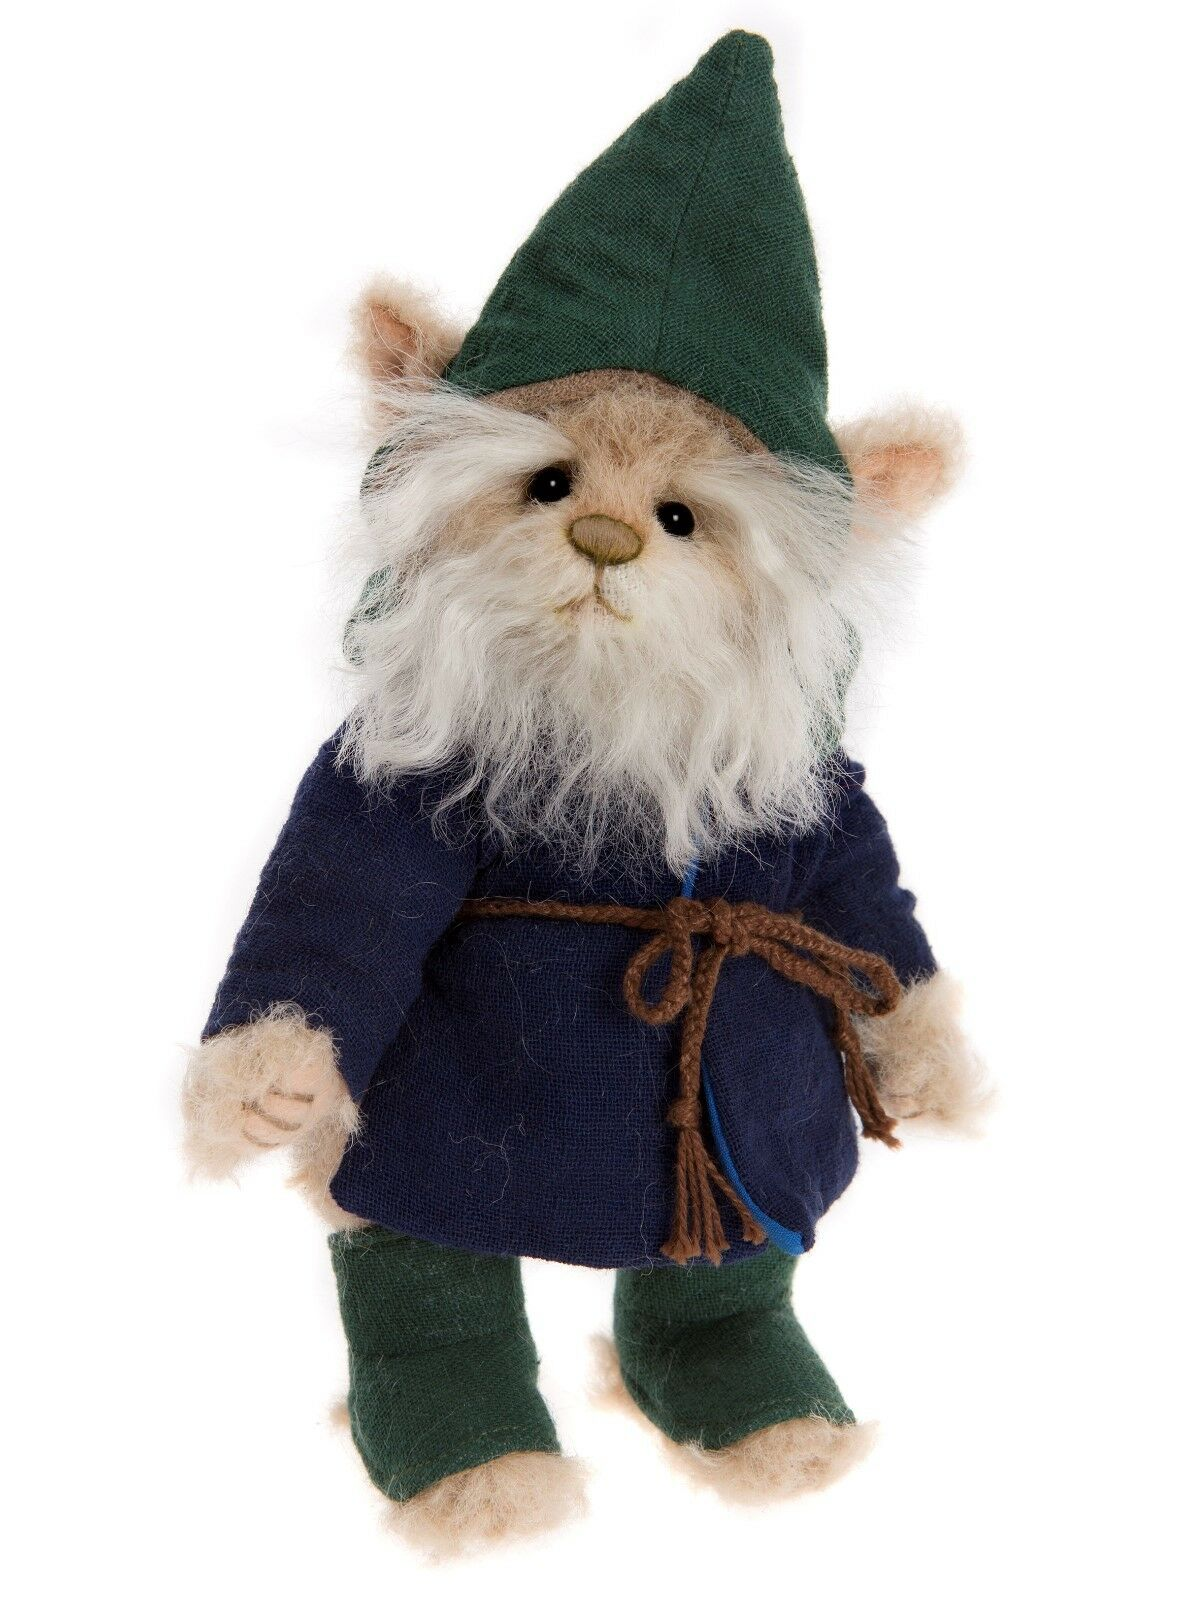 GUMP Charlie Bears Minimo Gnome  - MM175614B  Ltd Ed